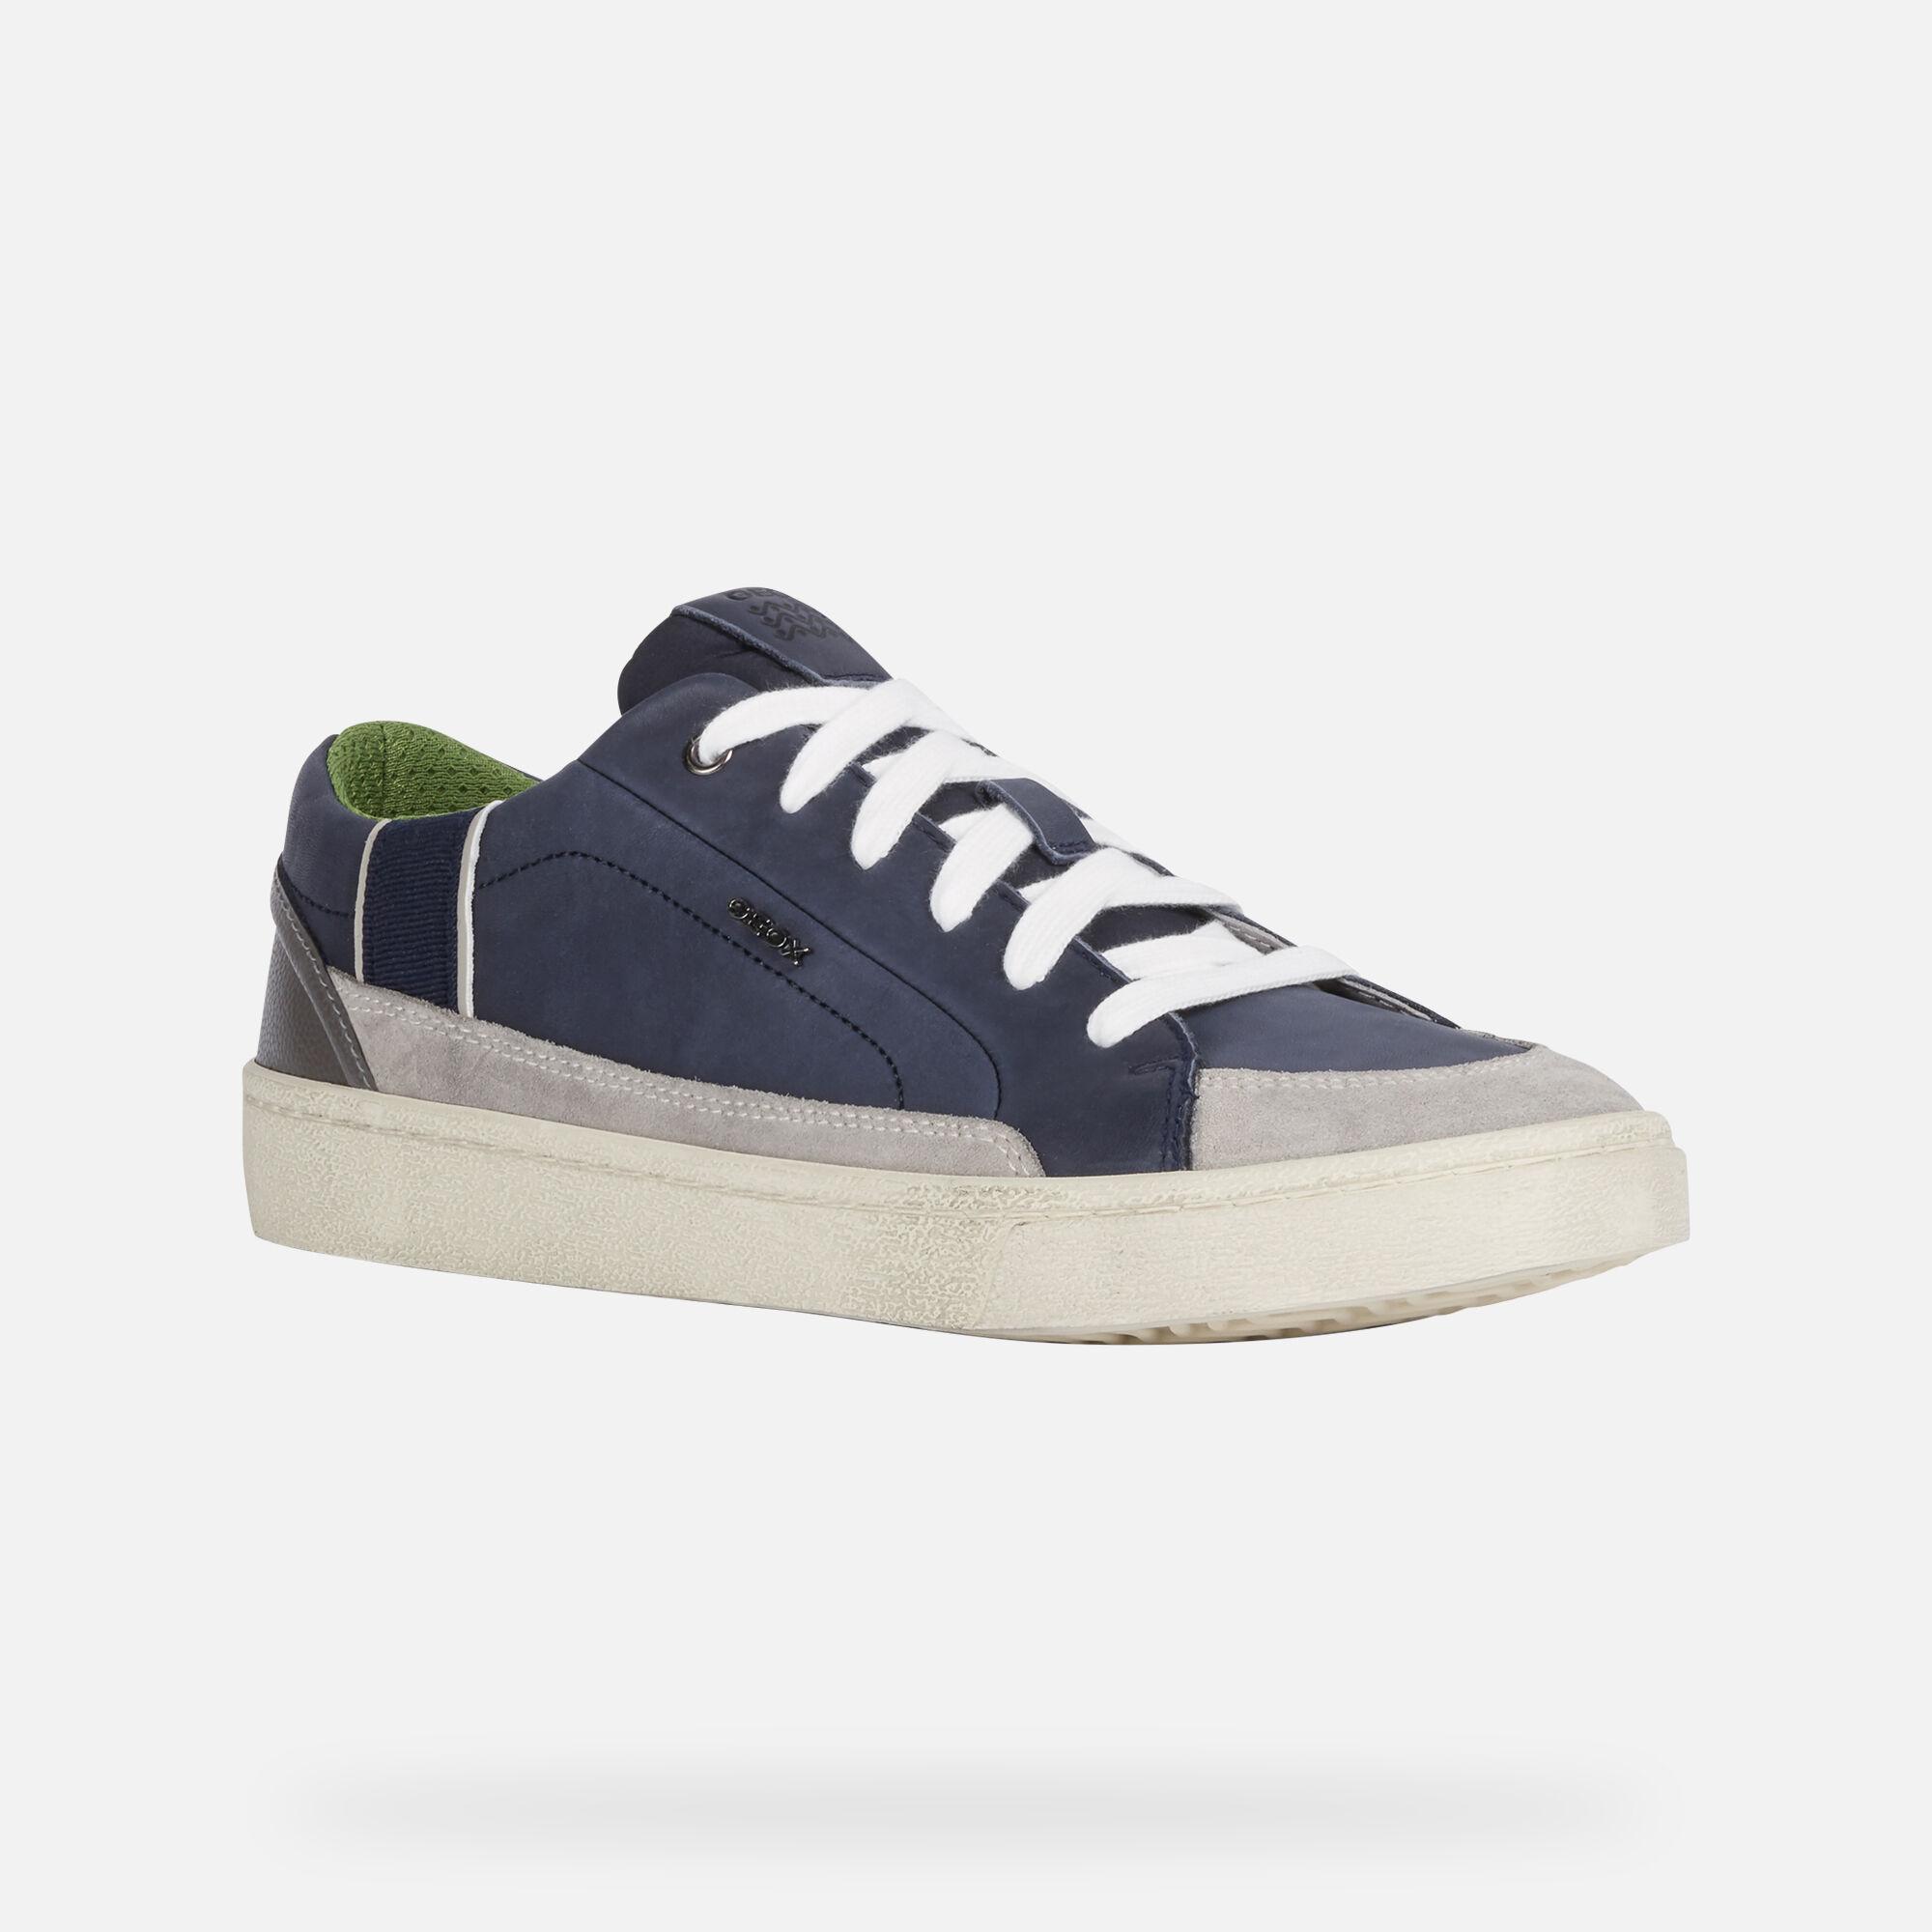 GEOX WARLEY Uomo: Sneakers Basse Blu | GEOX ® Sito Ufficiale